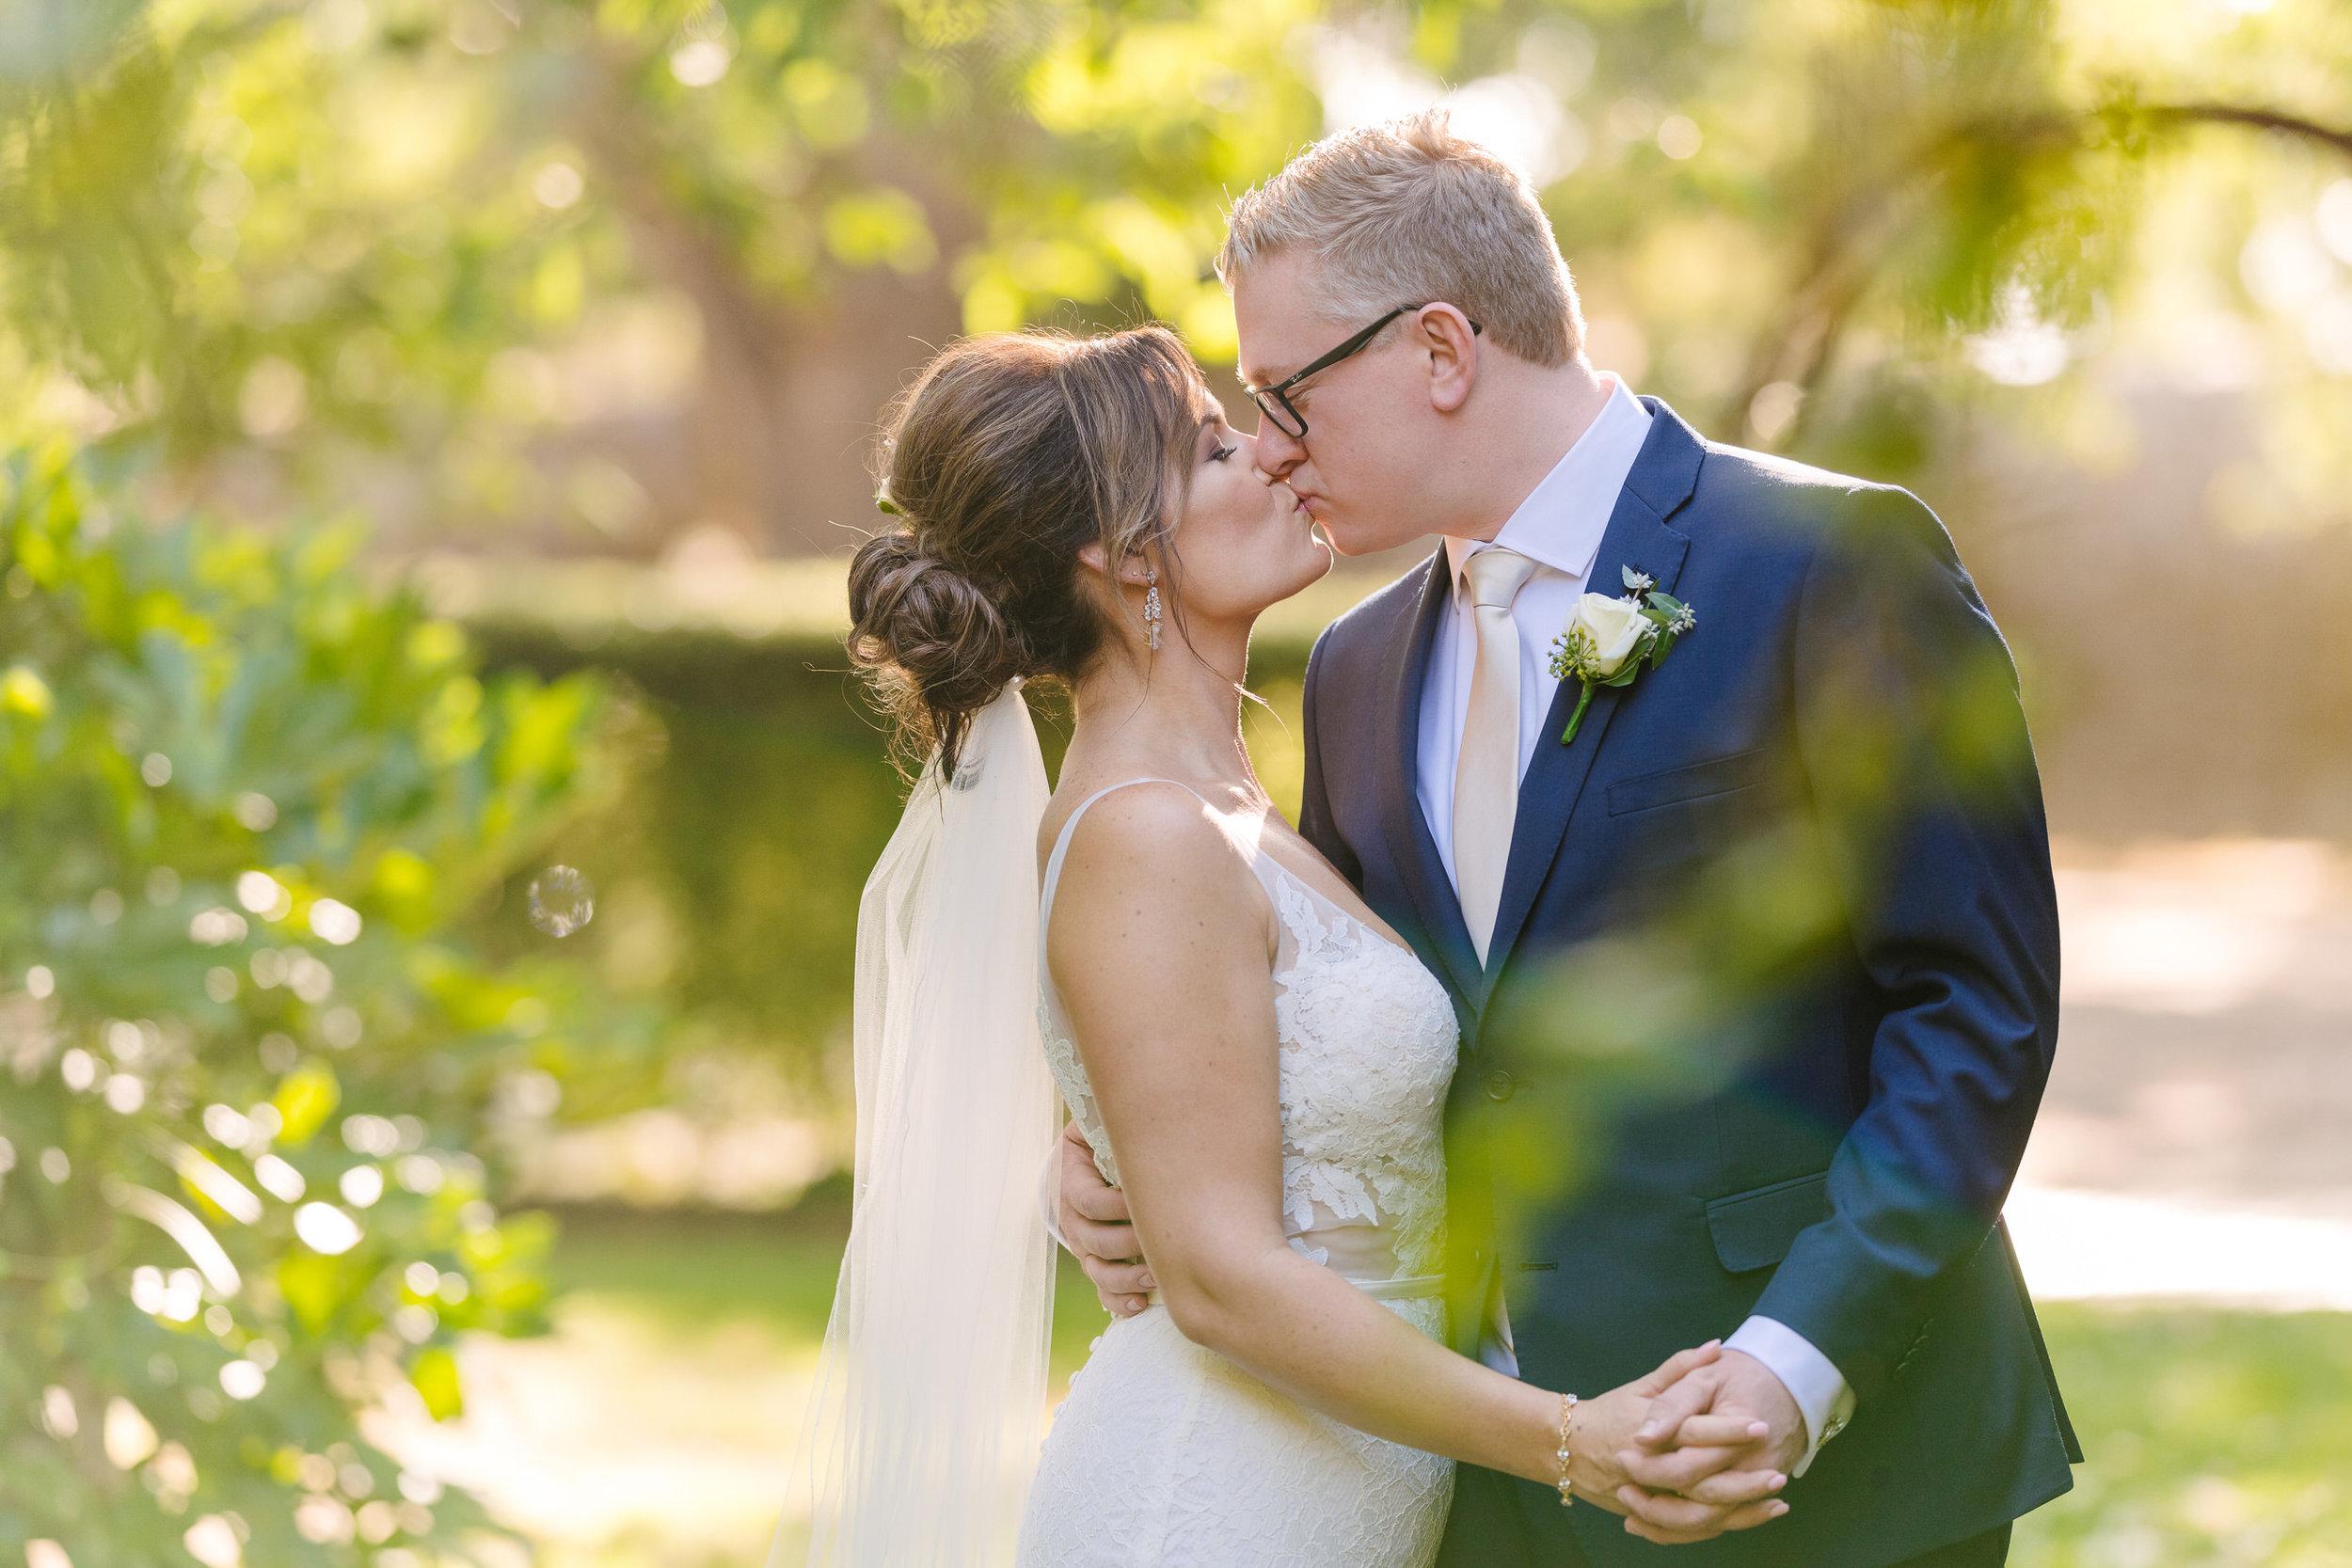 Justin_And_Jim_Photography_Chateau_Dore_Bendigo_Wedding56.JPG